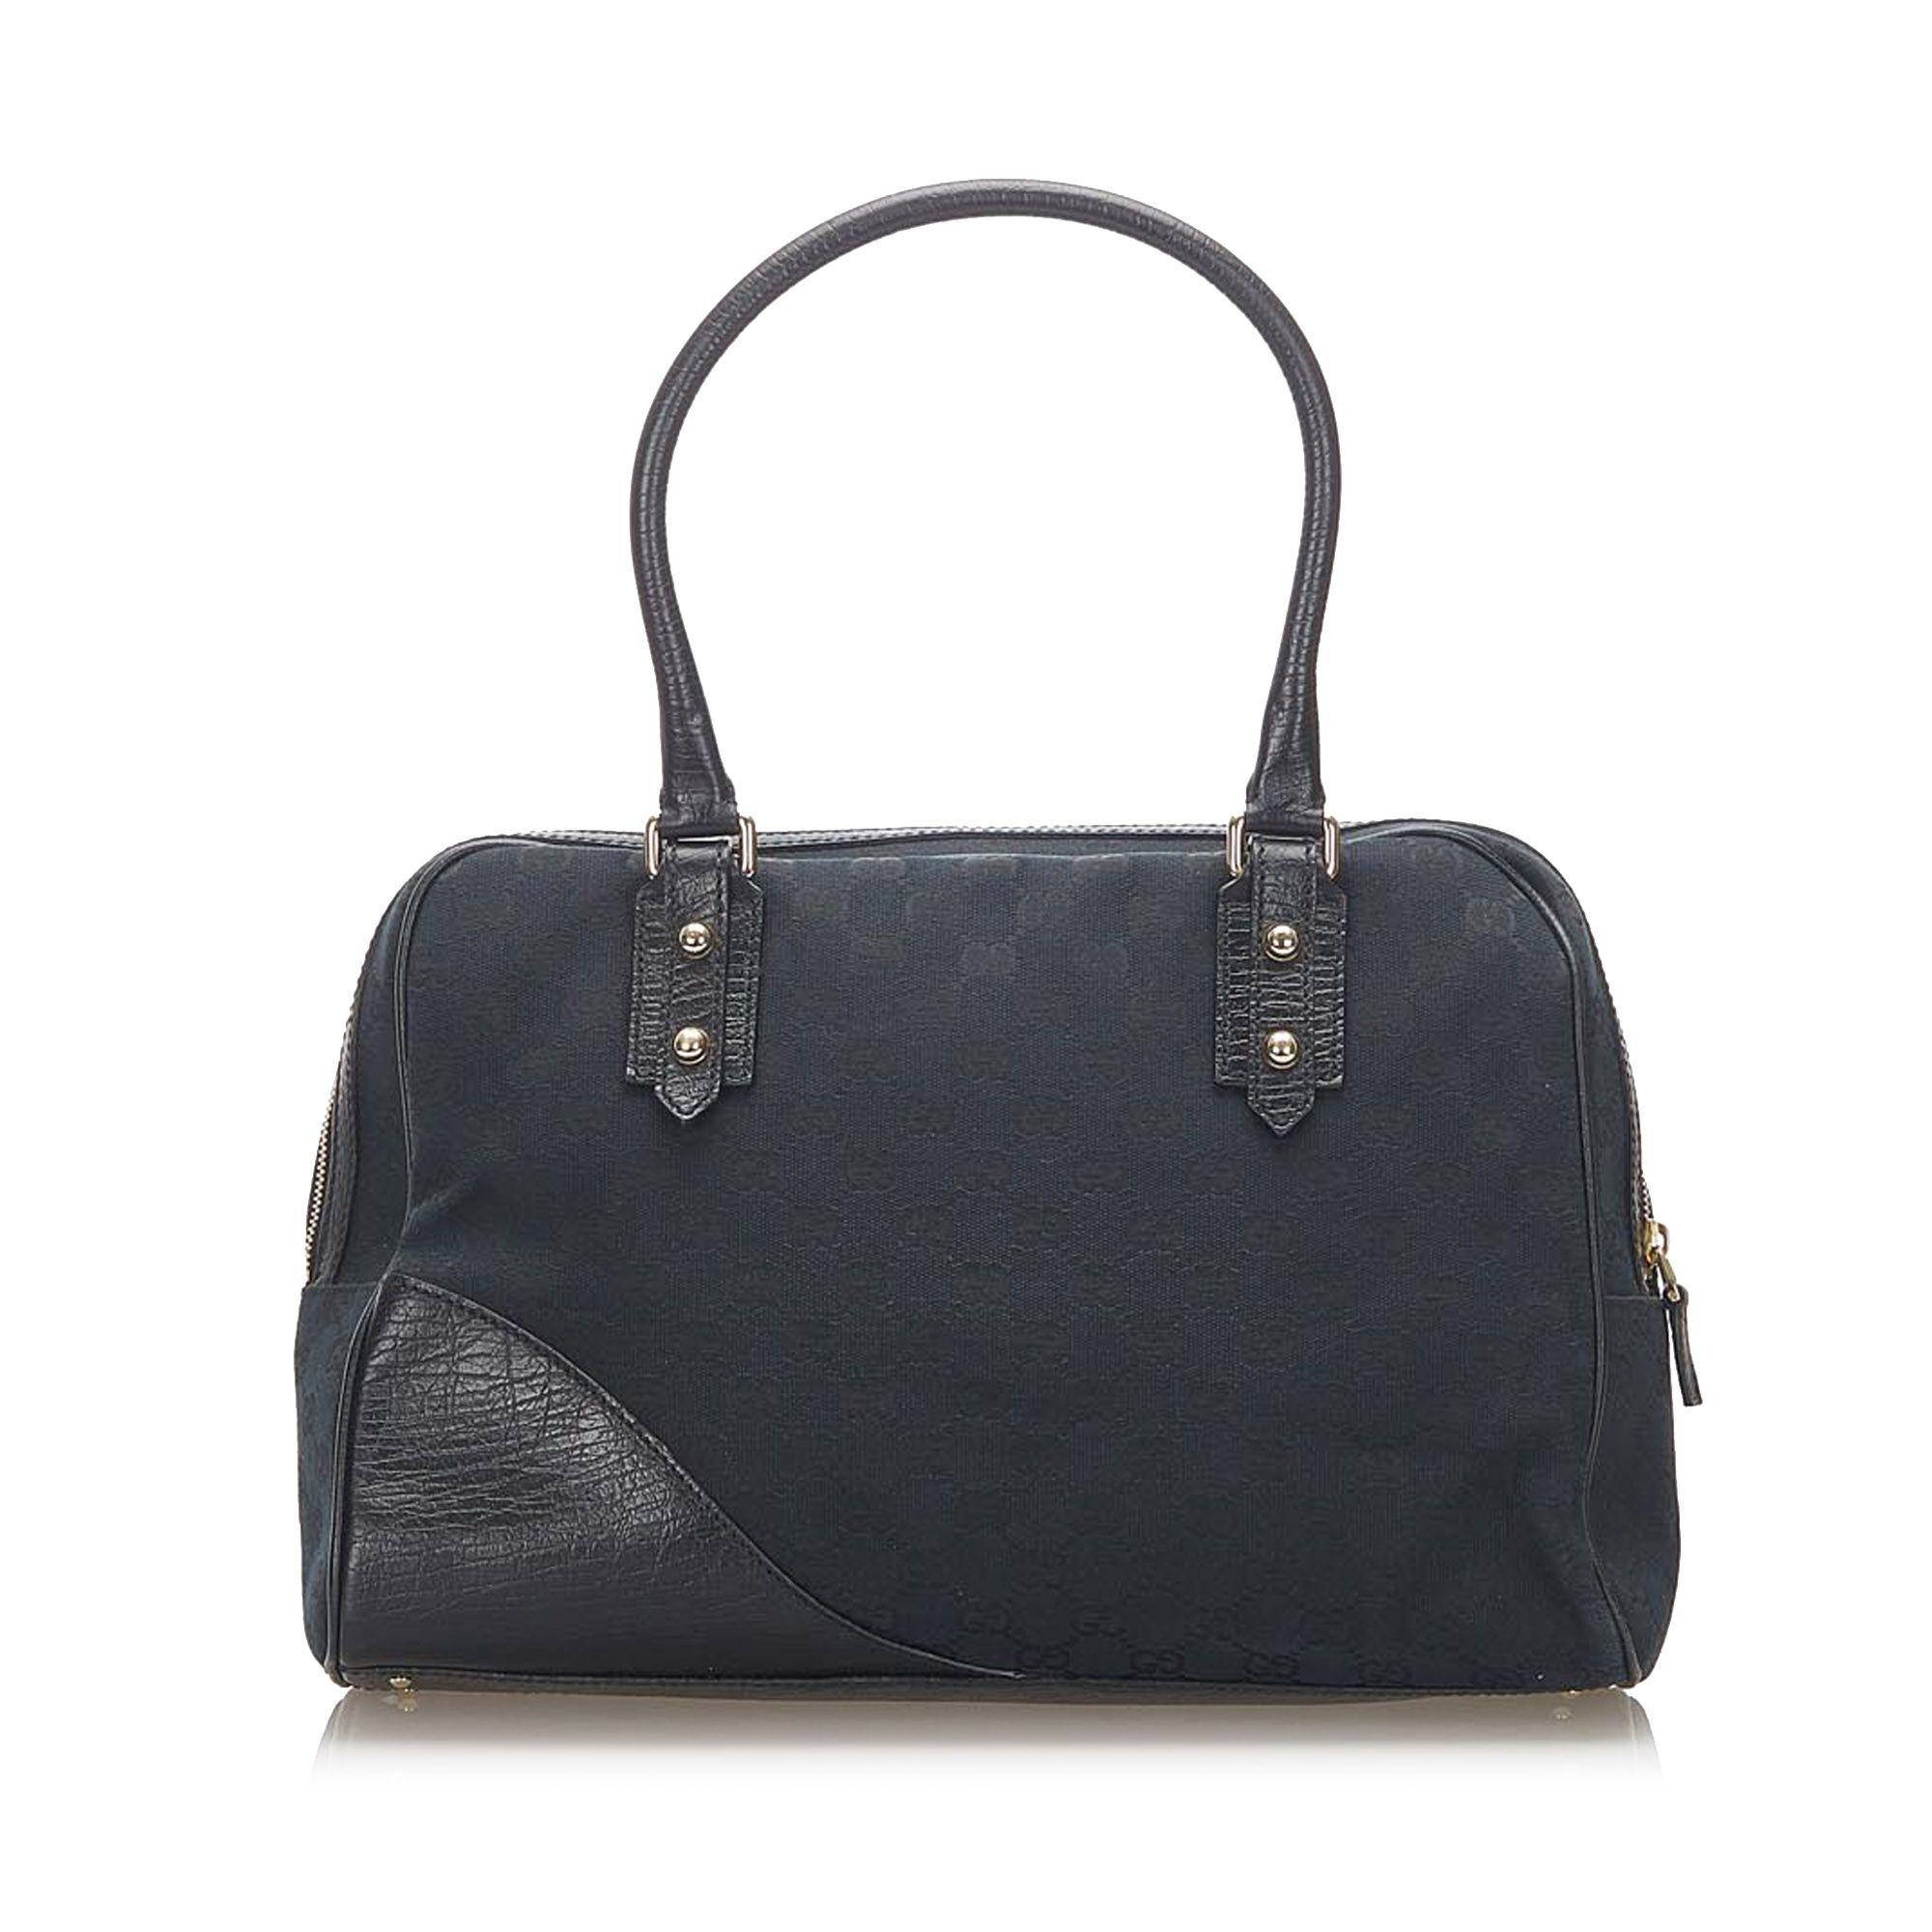 Vintage Gucci GG Canvas Hasler Handbag Black